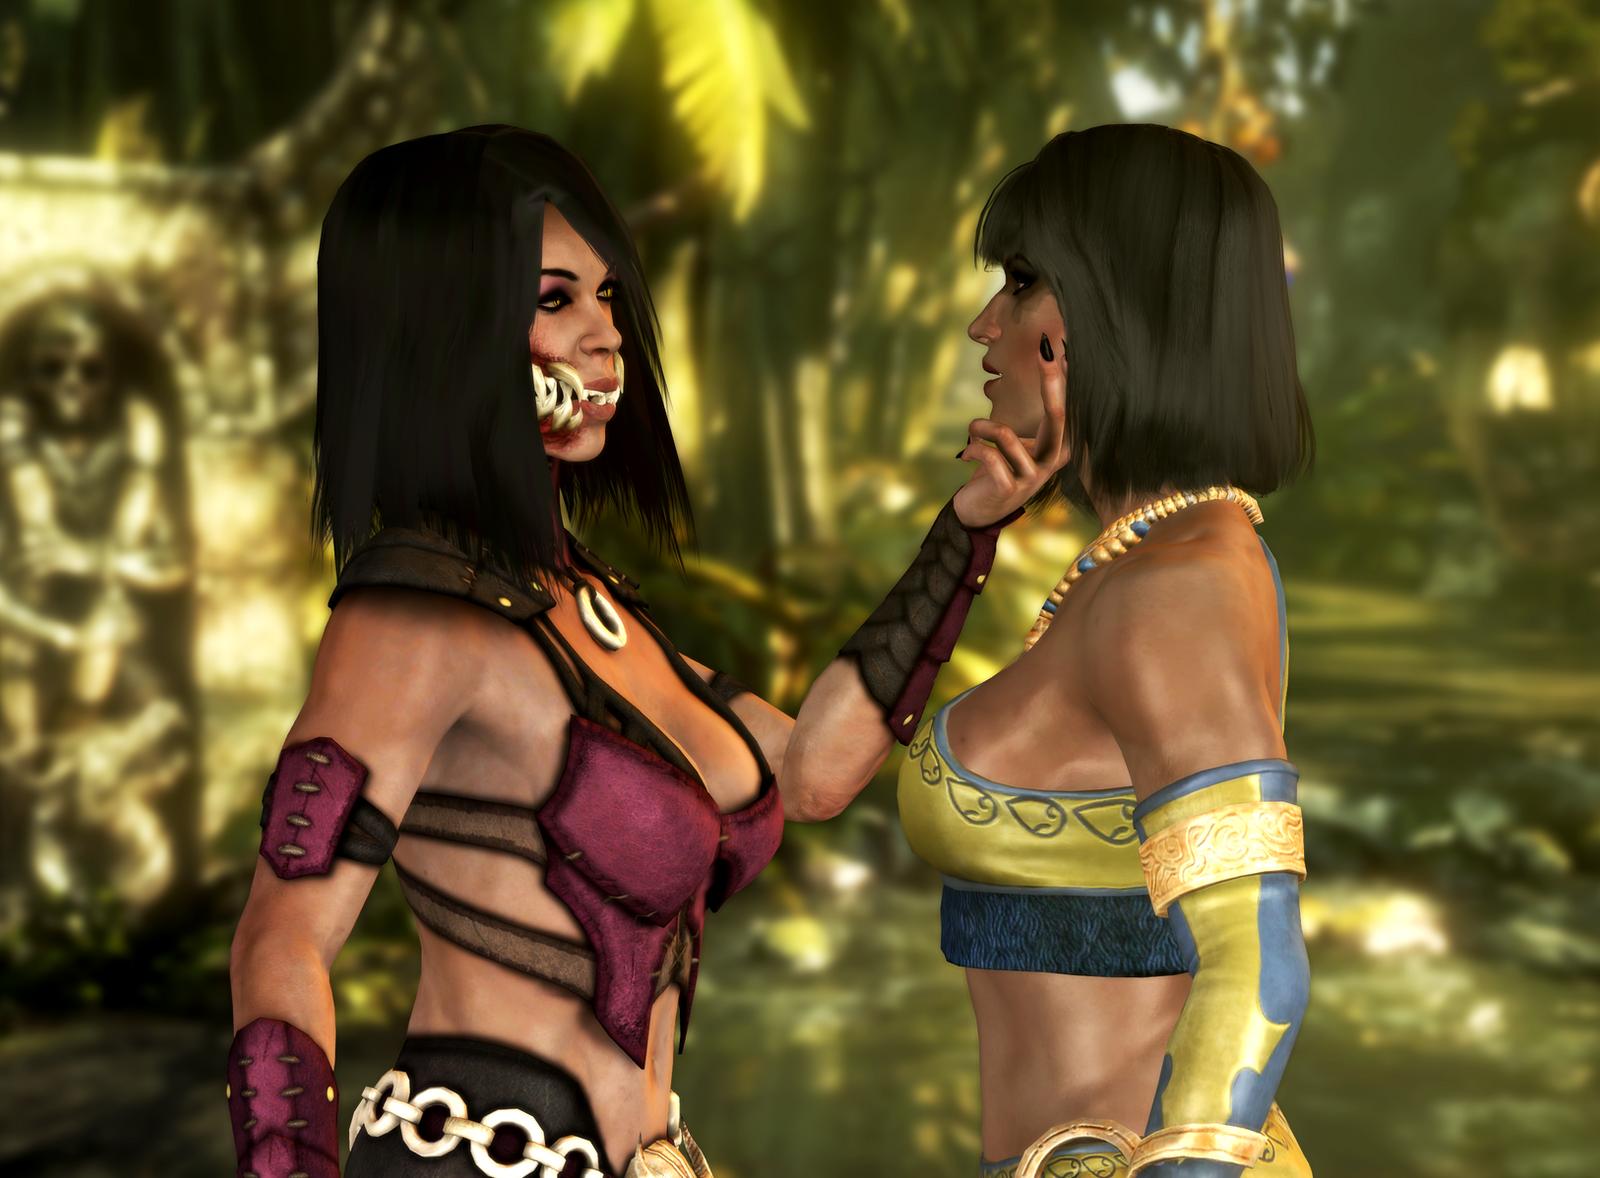 cosplay kitana Mortal kombat hentai